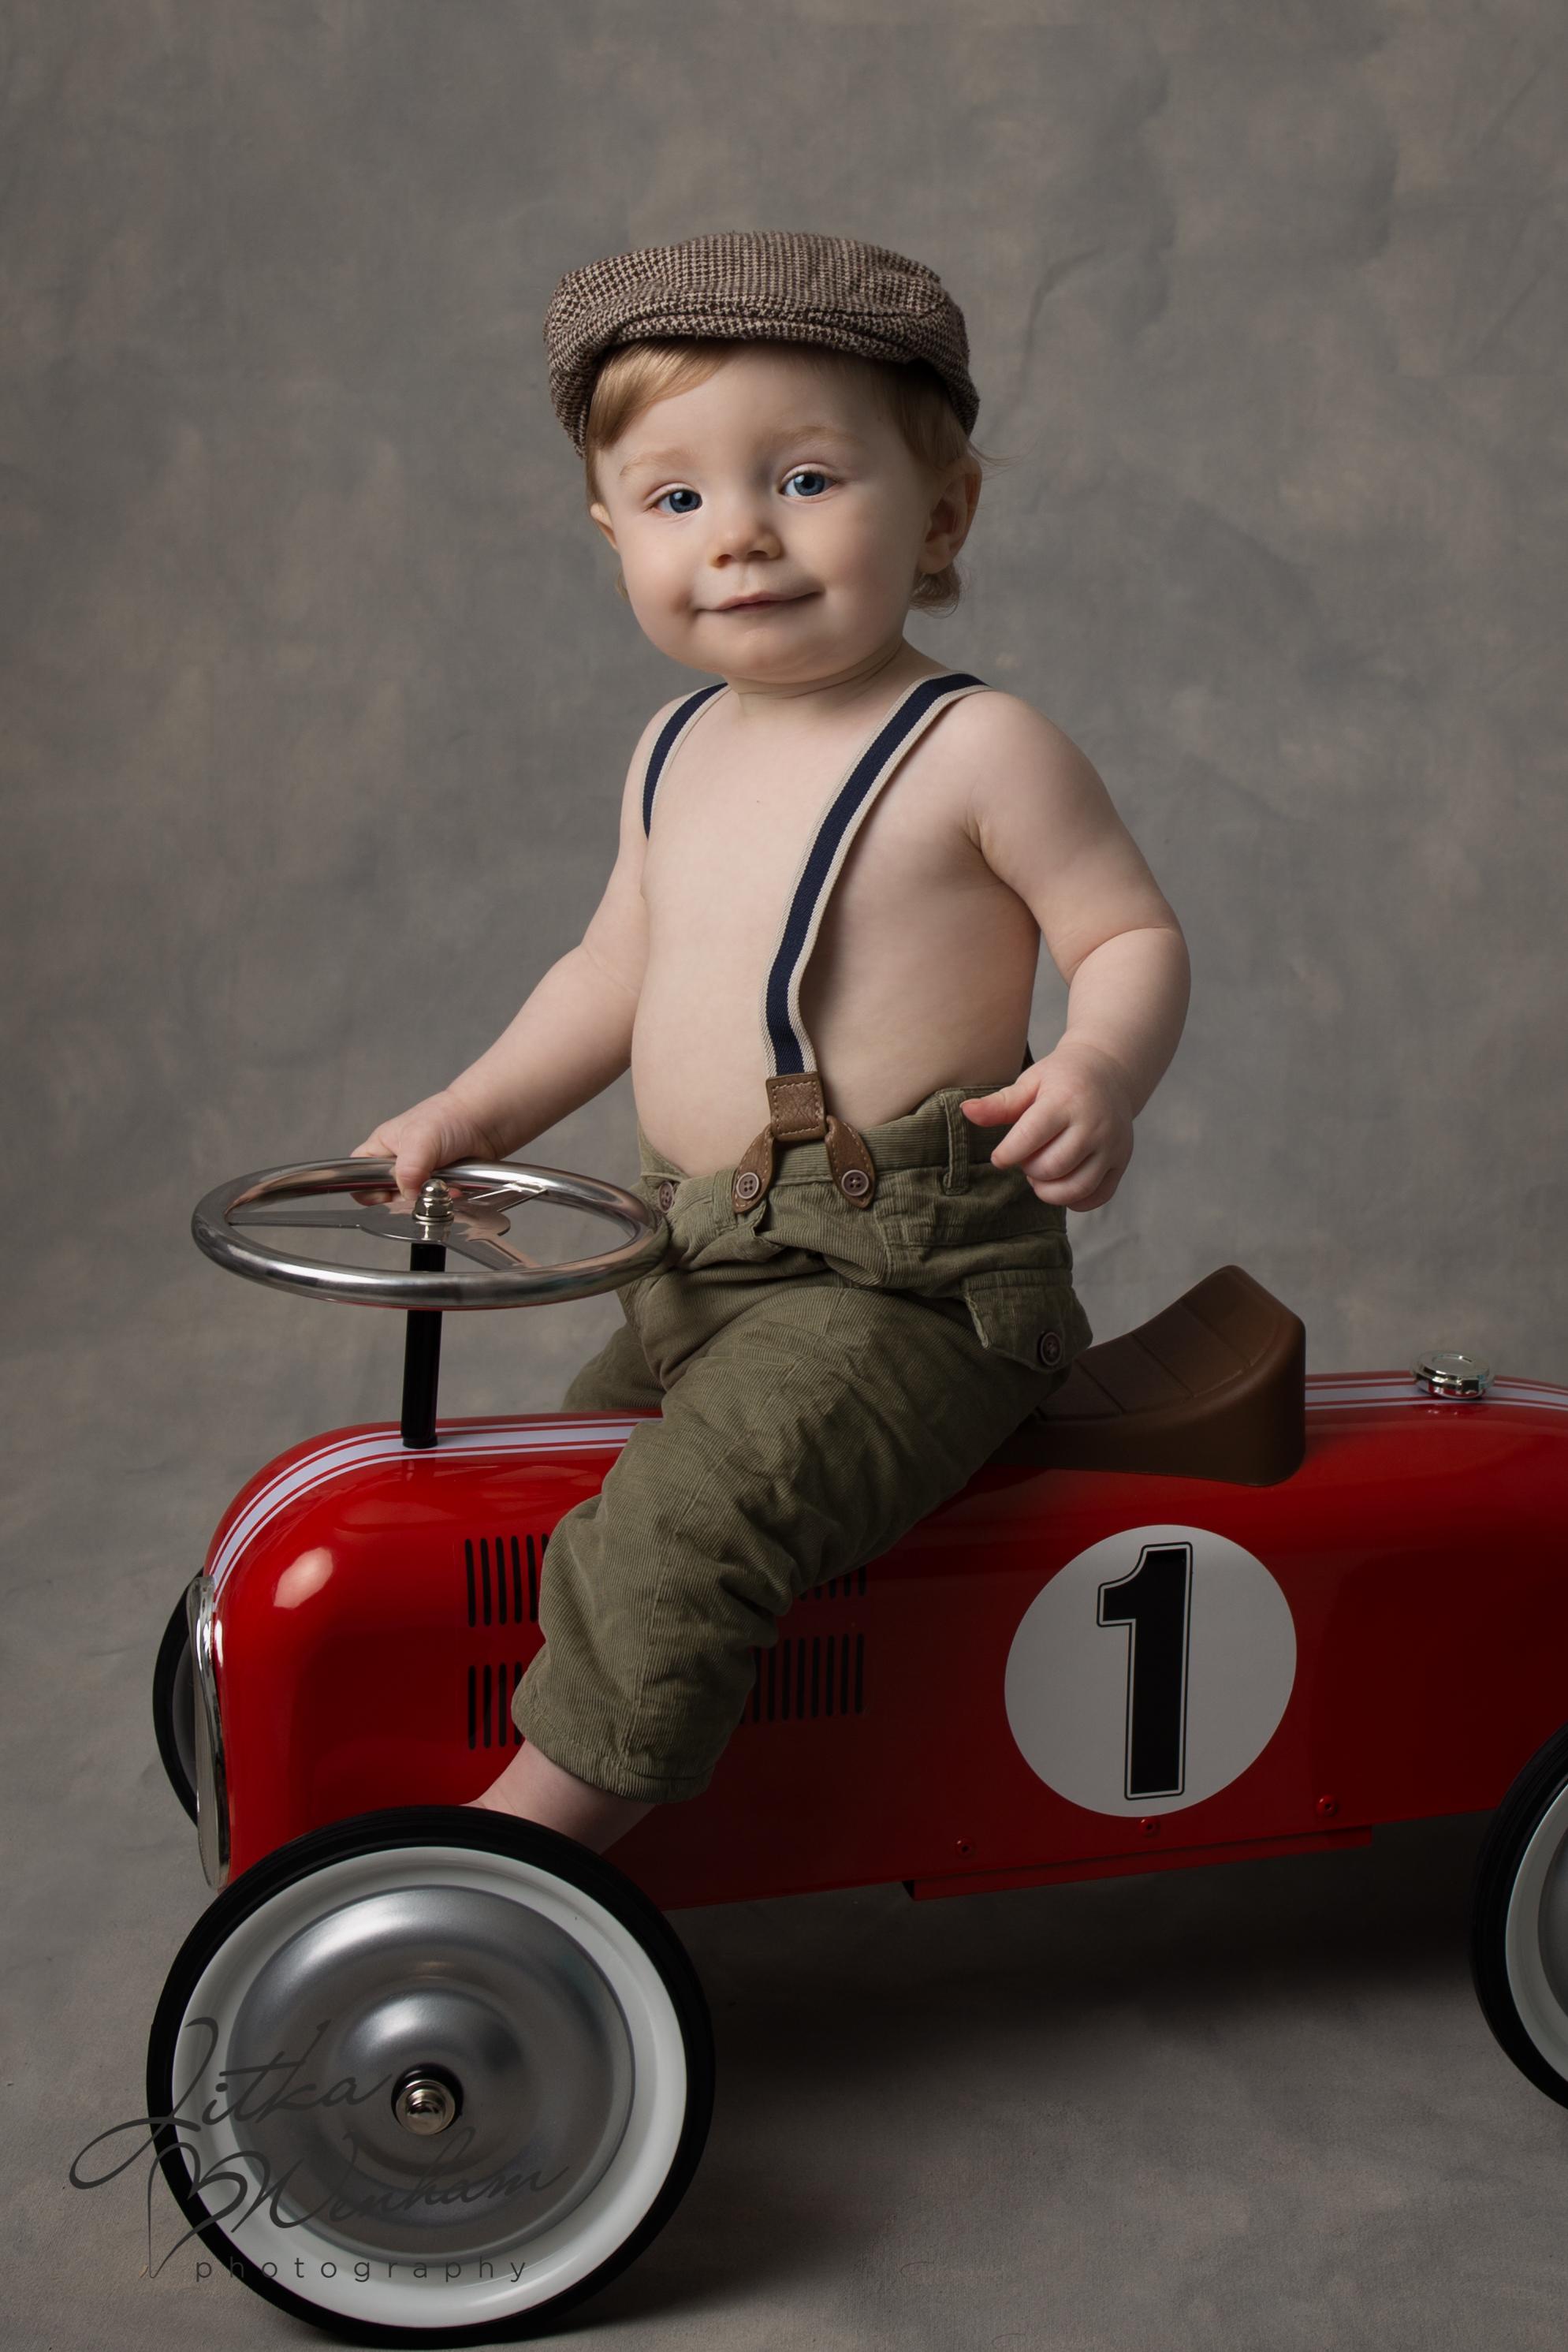 newborn-photography-children-baby-milton keynes-cake-smash-z-1-14.jpg